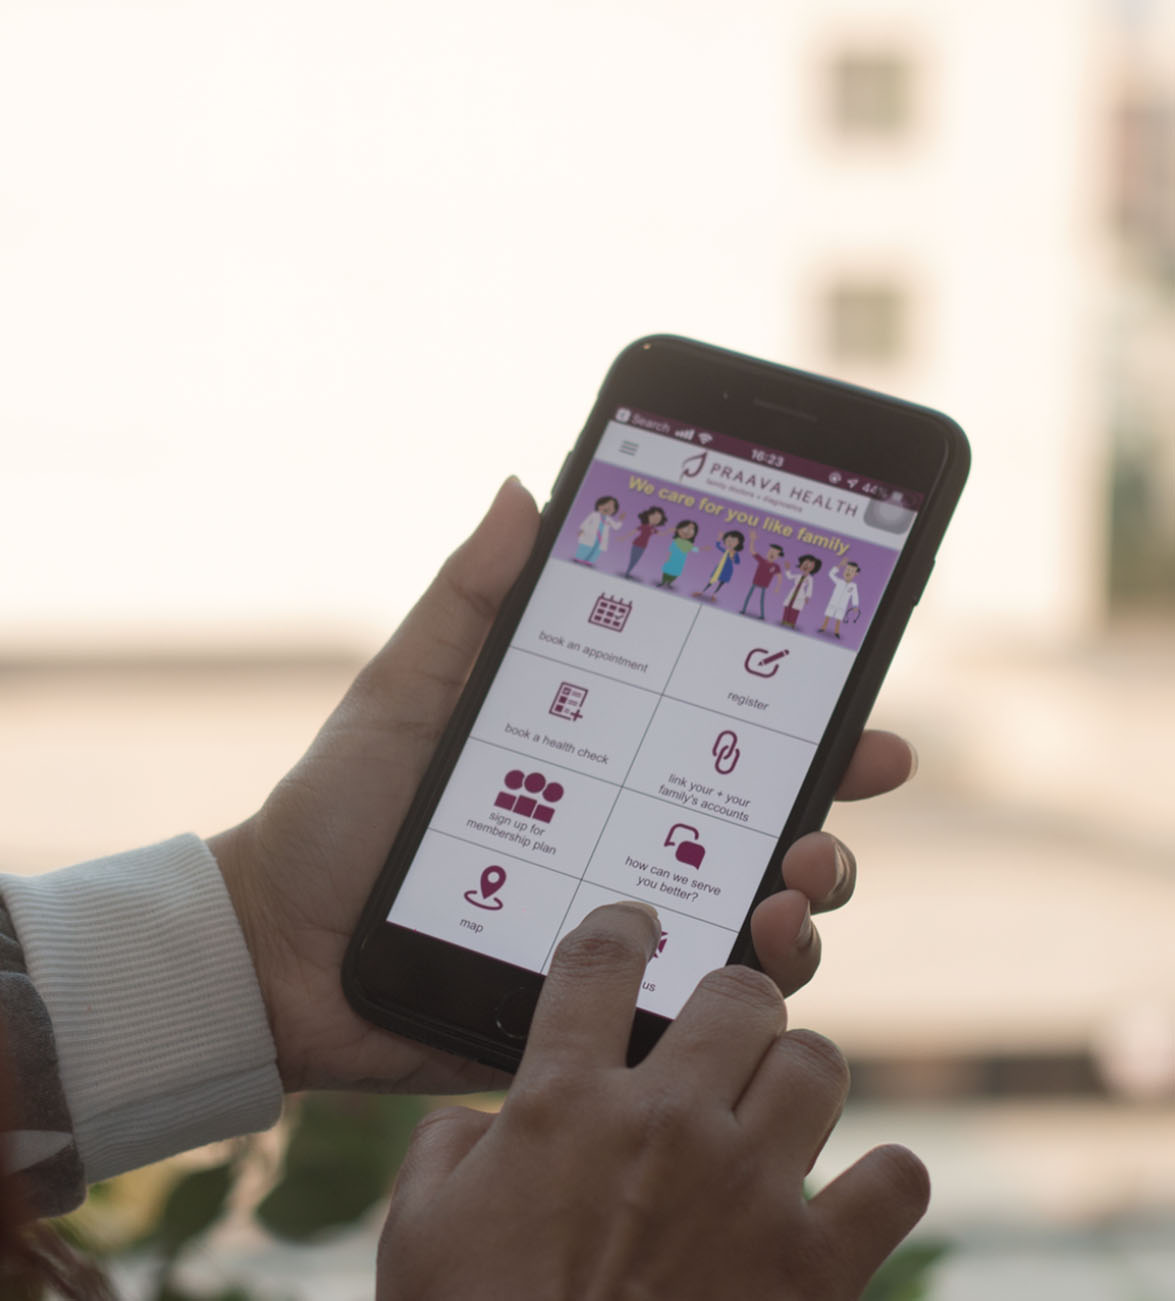 Praava Health's patient portal app